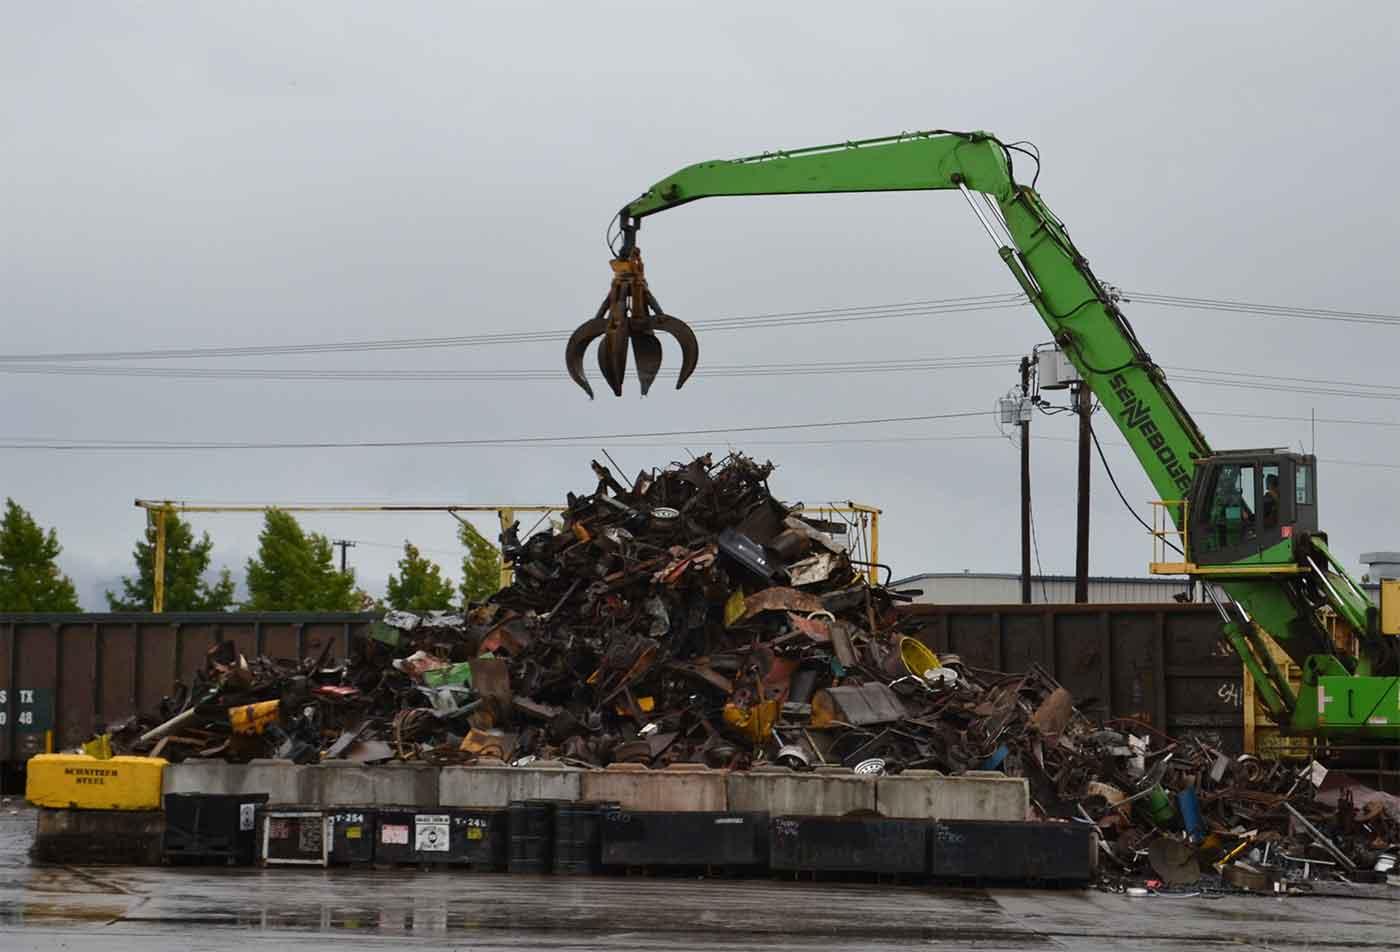 Scrap metal in Eugene, Oregon